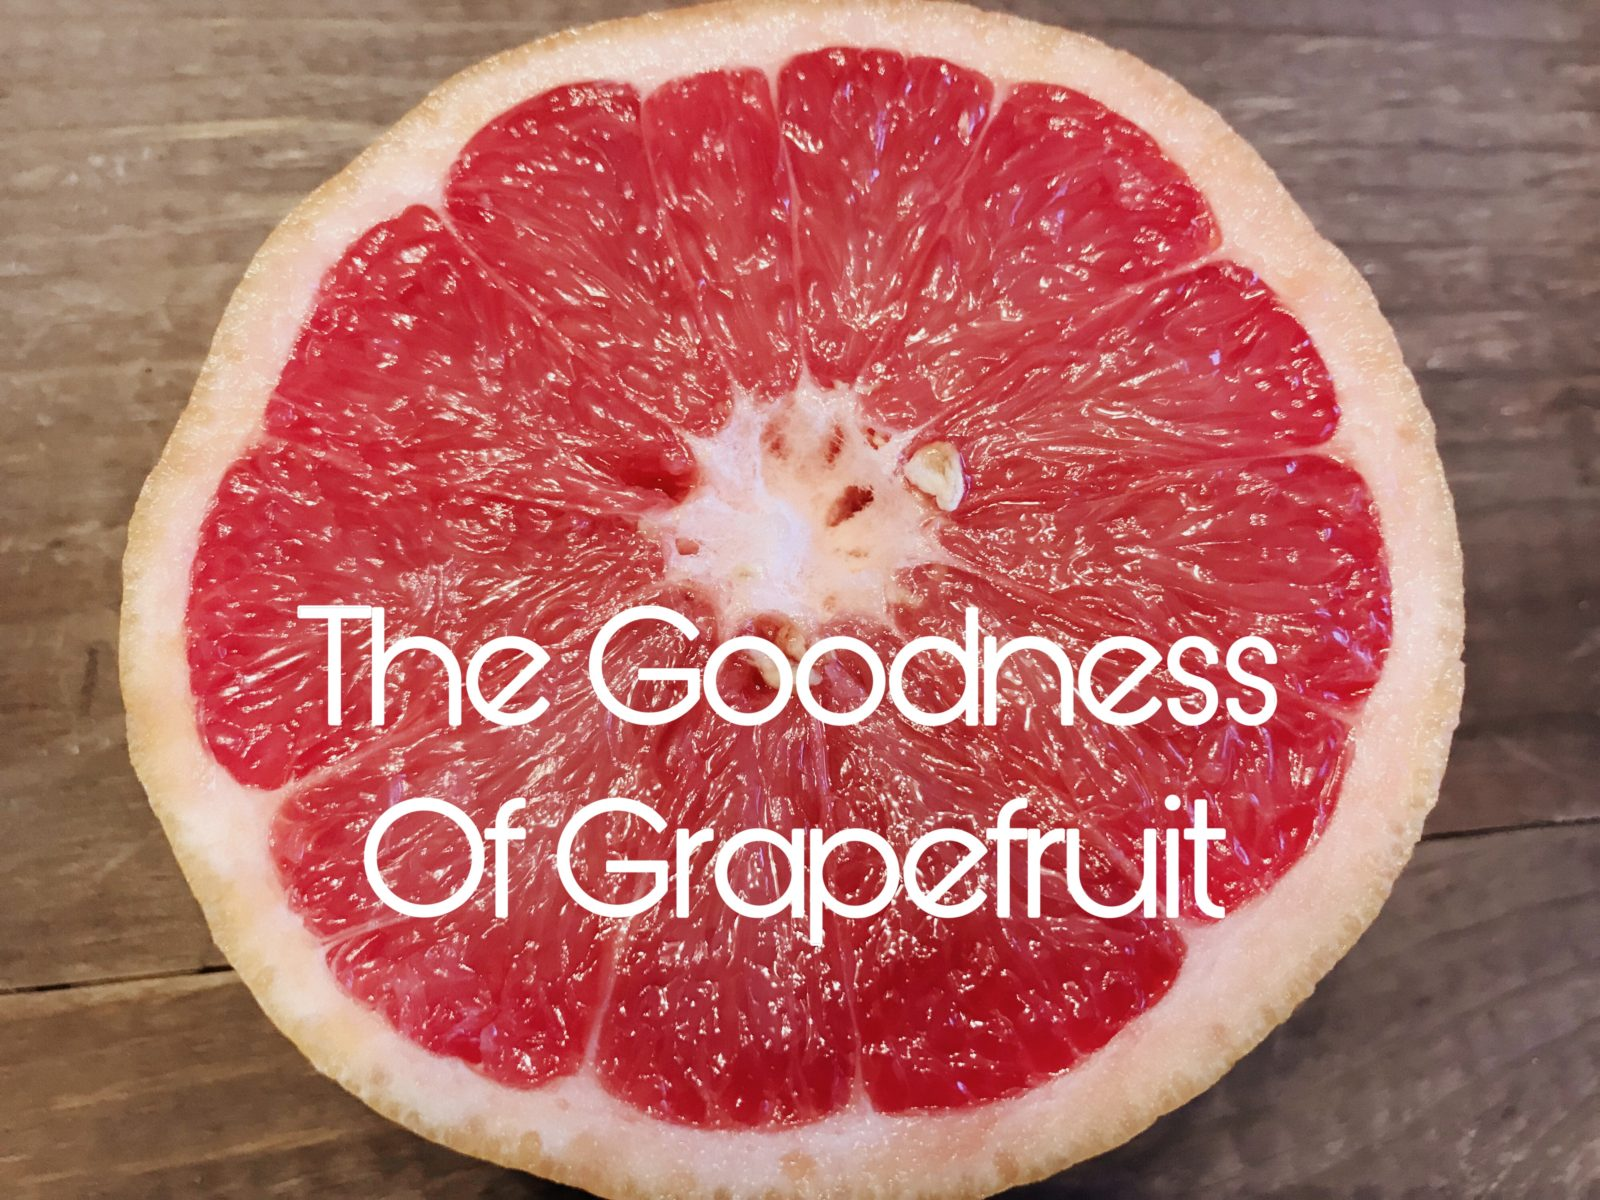 The Goodness of Grapefruit